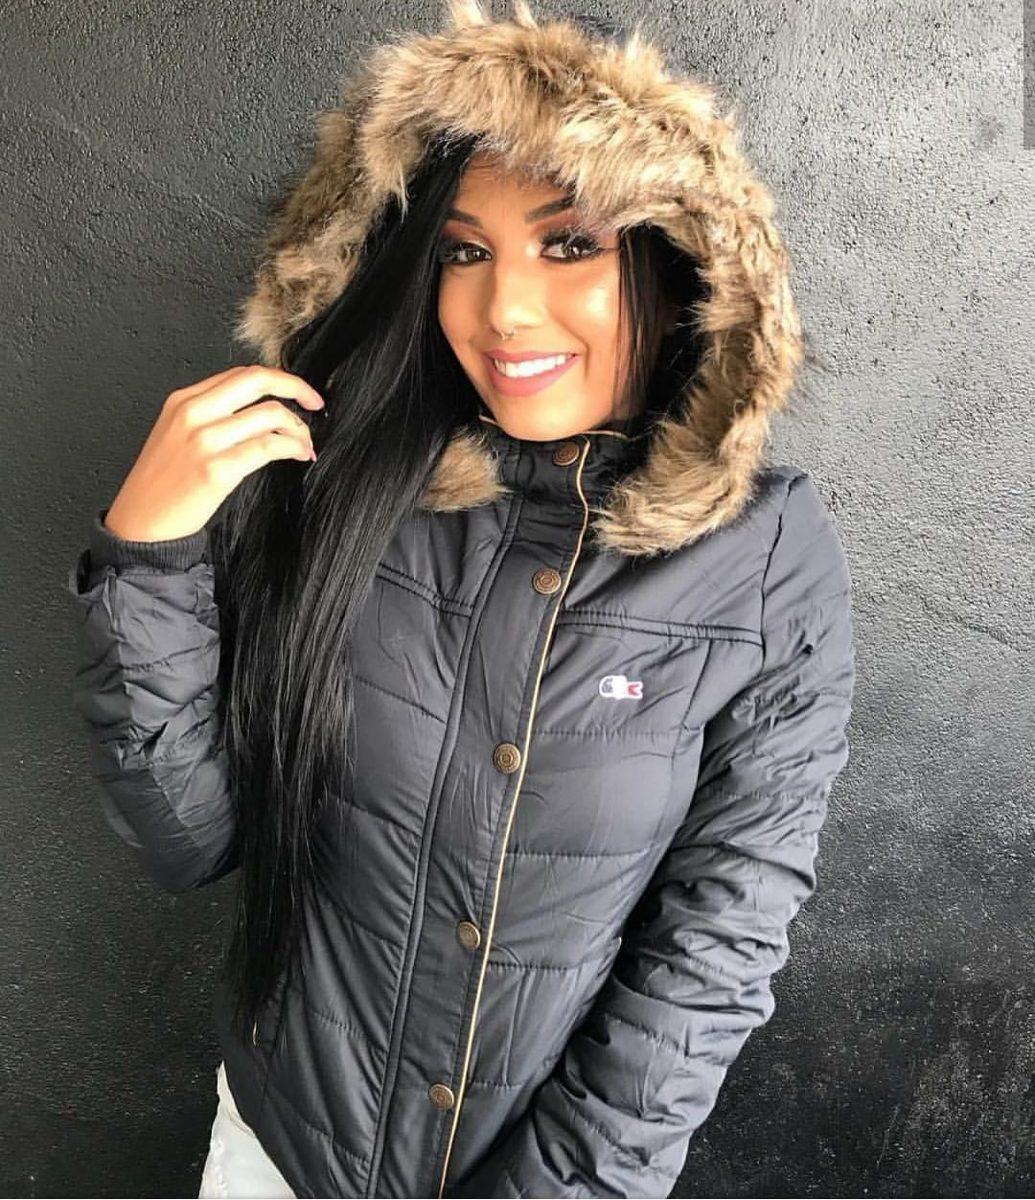 77daa784f09ef jaqueta feminina lacoste para frio intenso frete gratis. Carregando zoom.